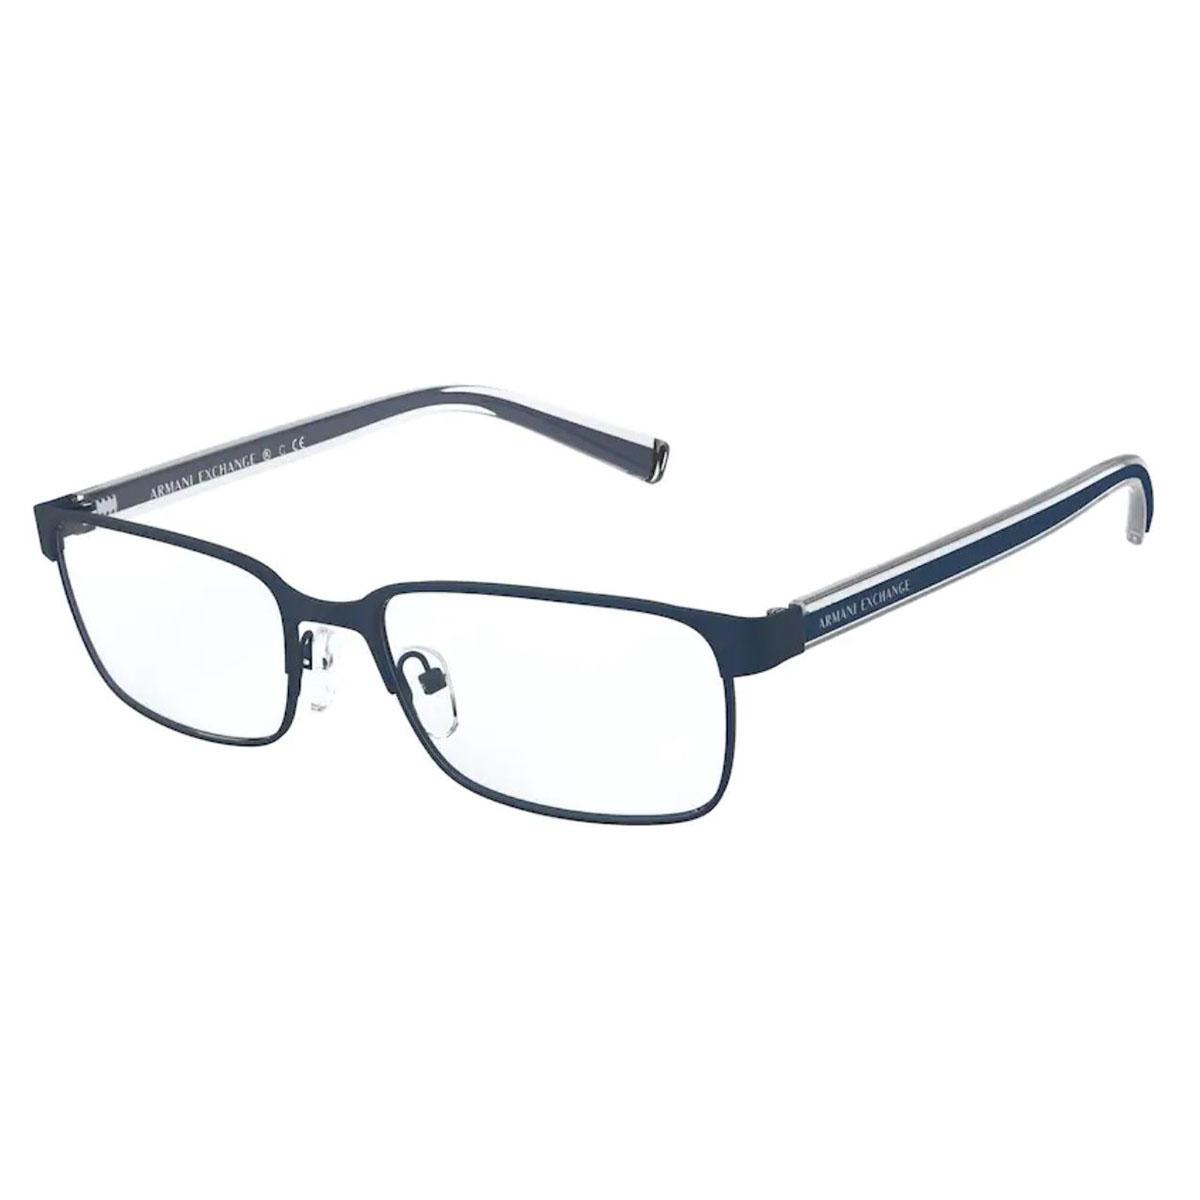 Óculos de Grau Armani Exchange AX1042 Azul Fosco